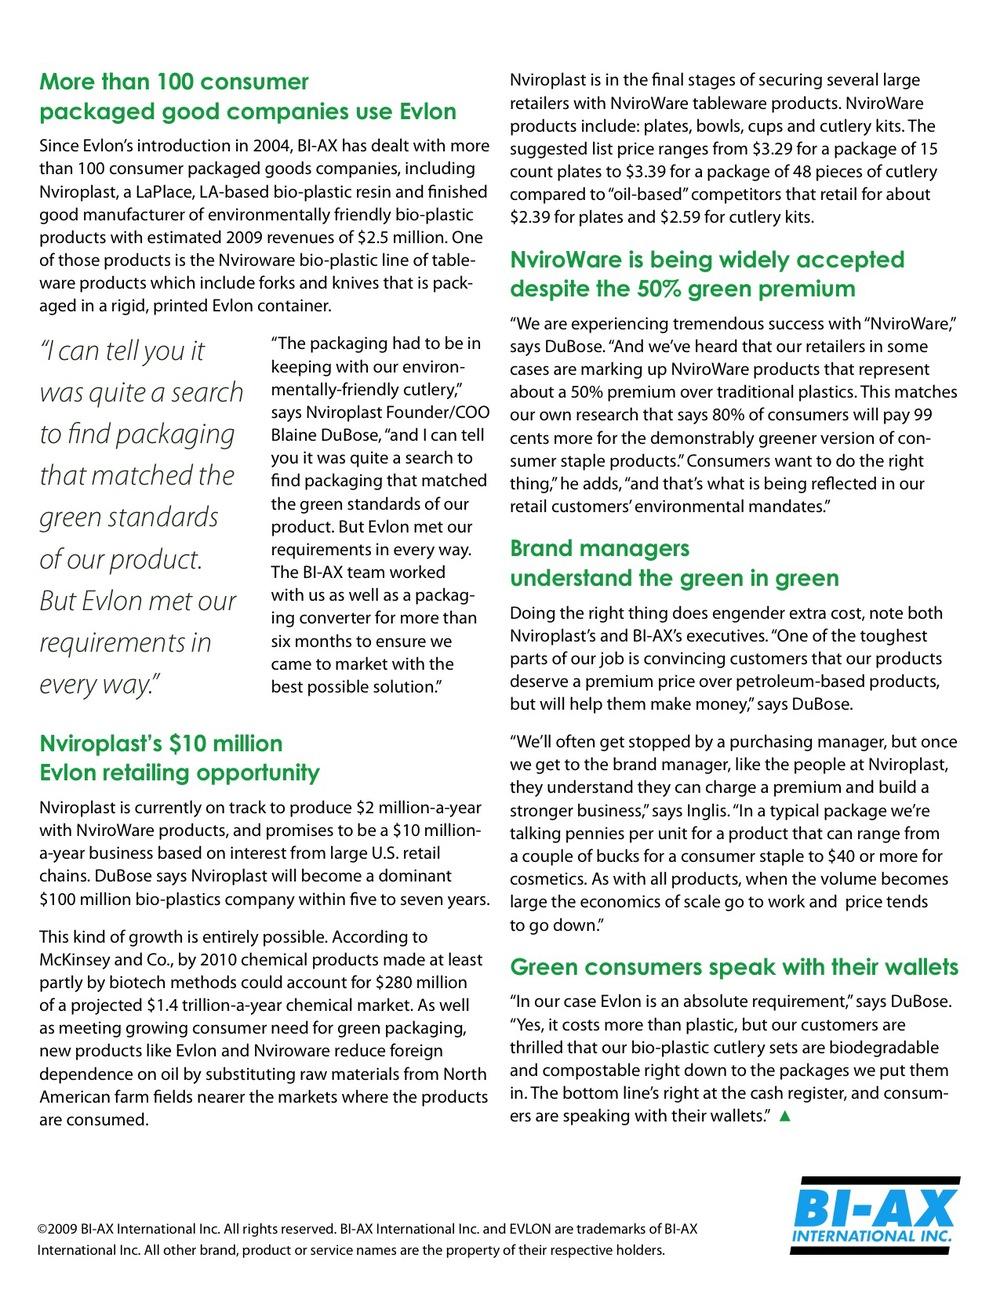 brandmanalert_Jul09_final-page2.jpg